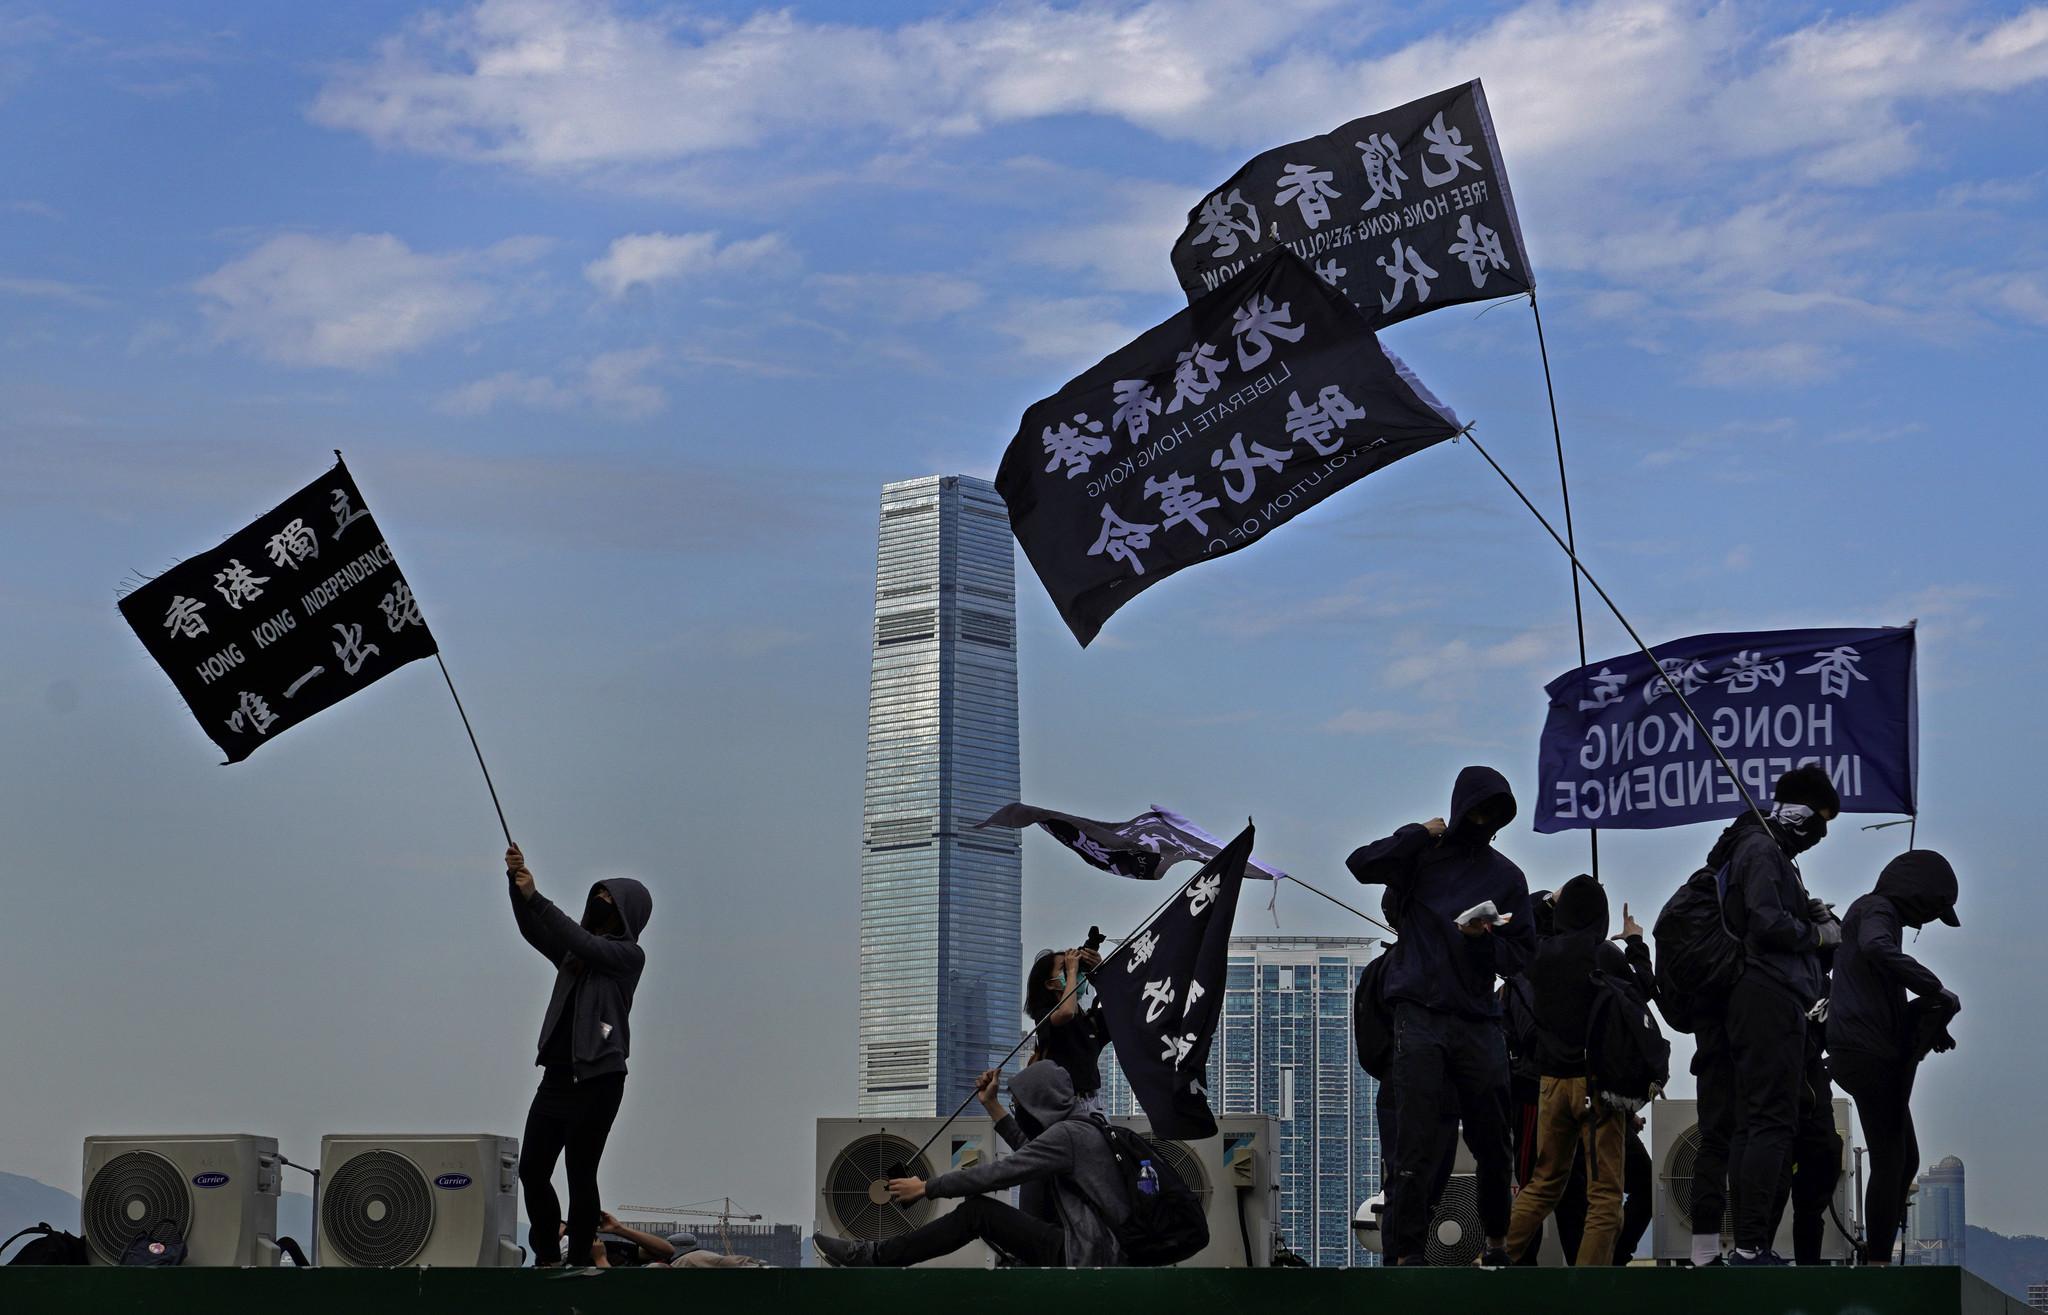 Hong Kong bans Human Rights Watch director from entering country